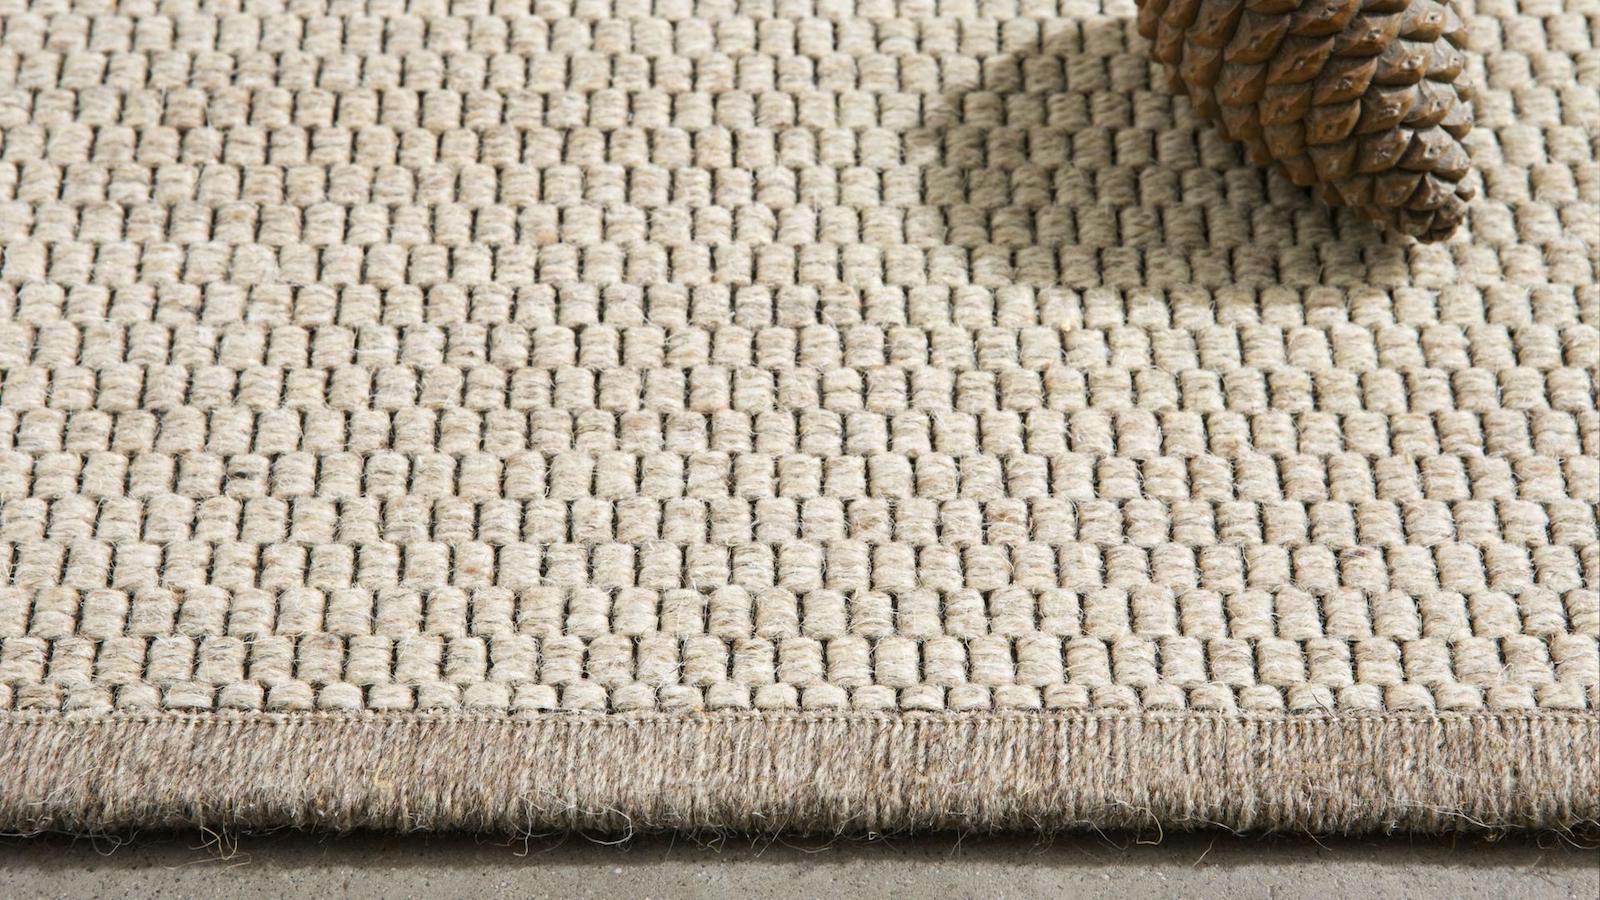 Tienda online alfombras ao eskila 12 montesina for Alfombras online